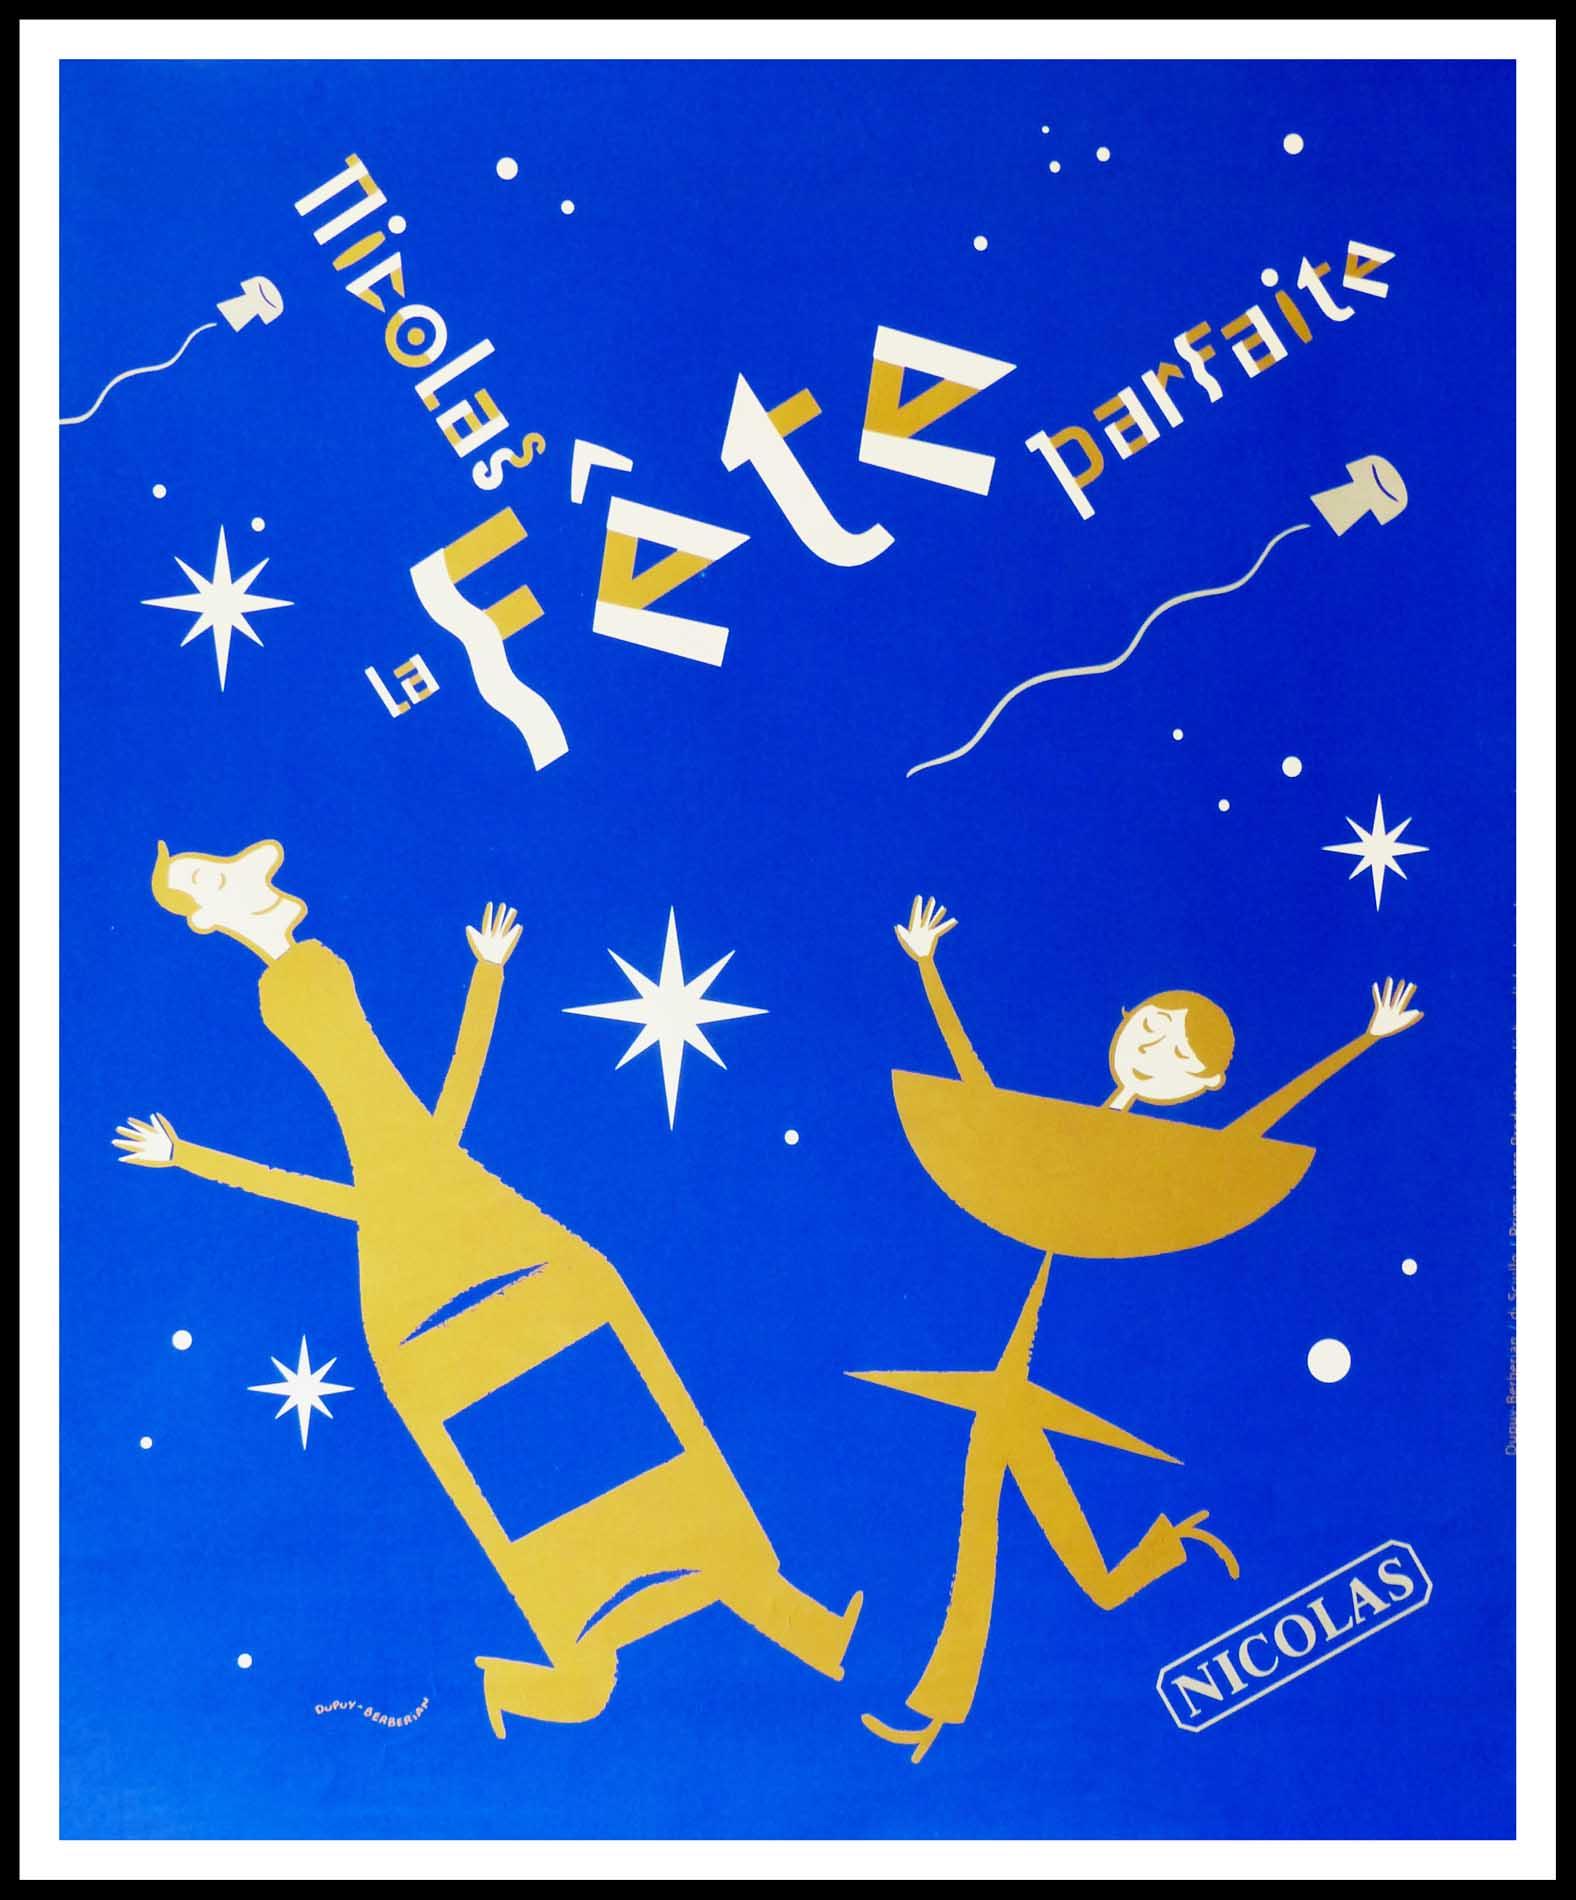 "(alt=""original wine poster NICOLAS, LA FETE PARFAITE NICOLAS 95 x 80 cm OFF LINEN Condition A+ circa 1990 DUPUY-BERBERIAN printed by LINEA PRODUCTION"")"